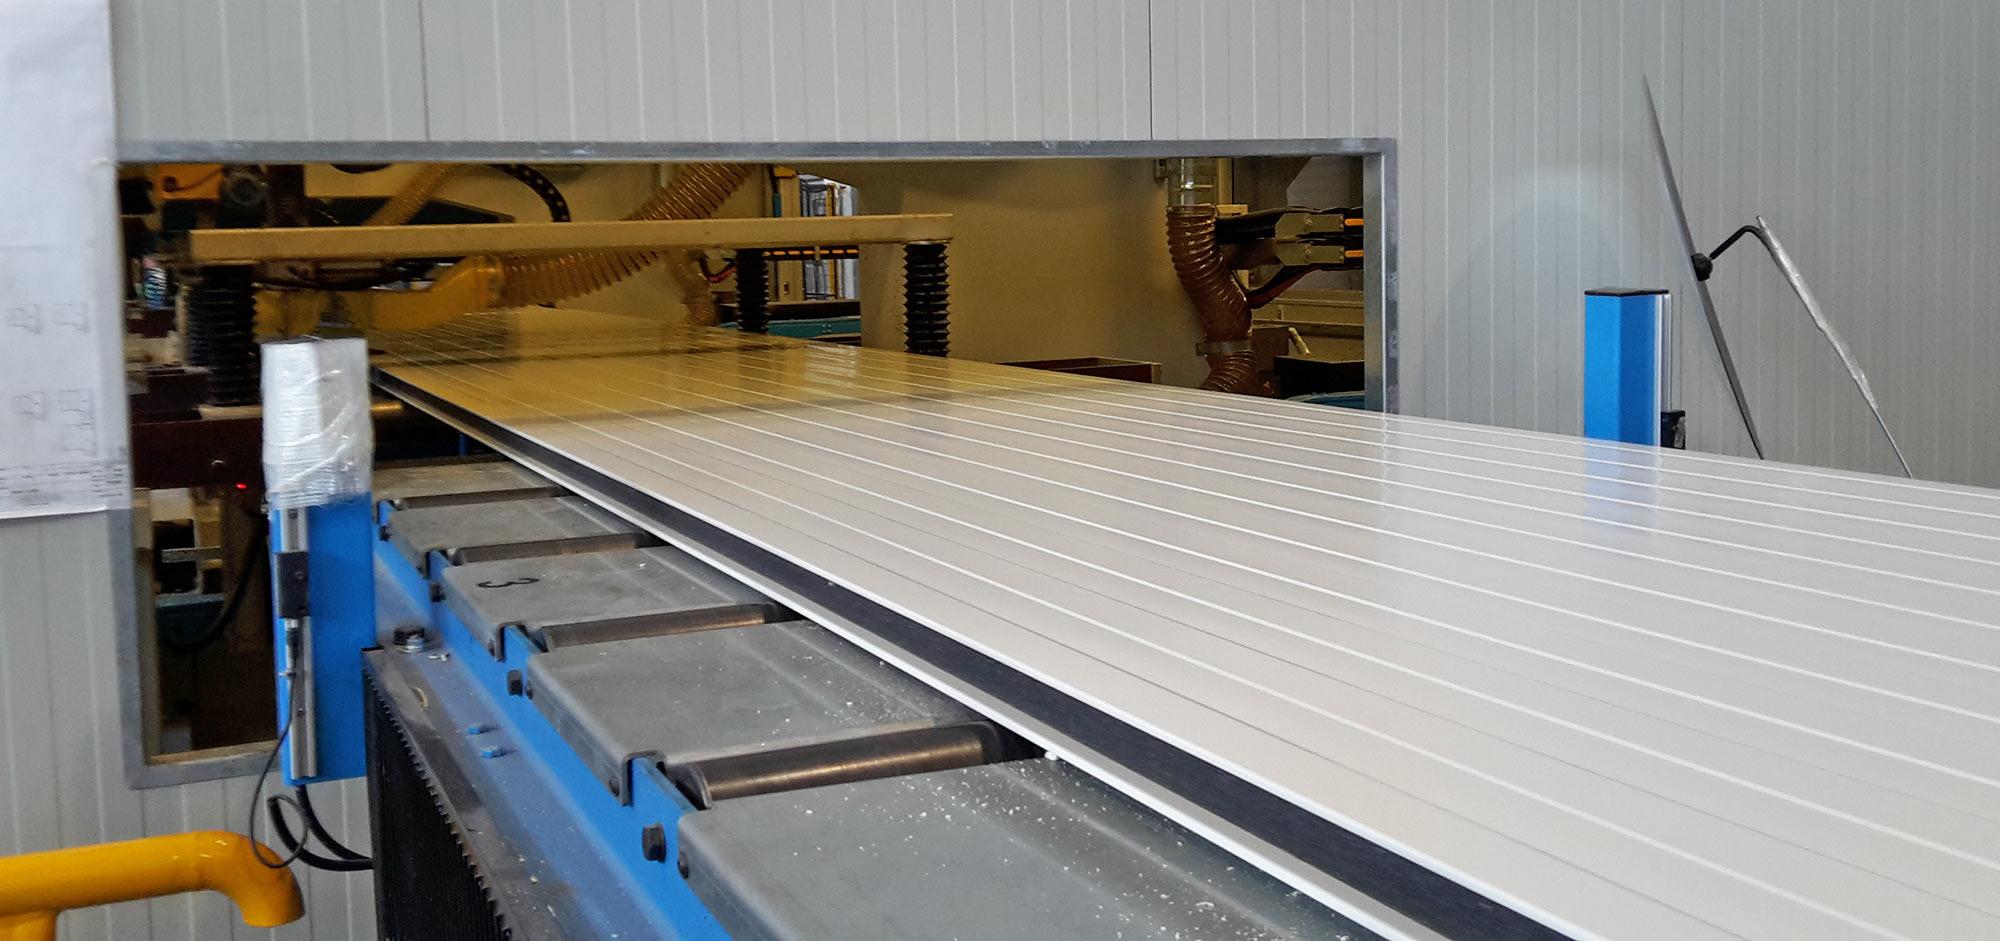 Häufig Haus Bauen Mit Sandwichplatten   Kega Holzbau Holzrahmenbau HV88